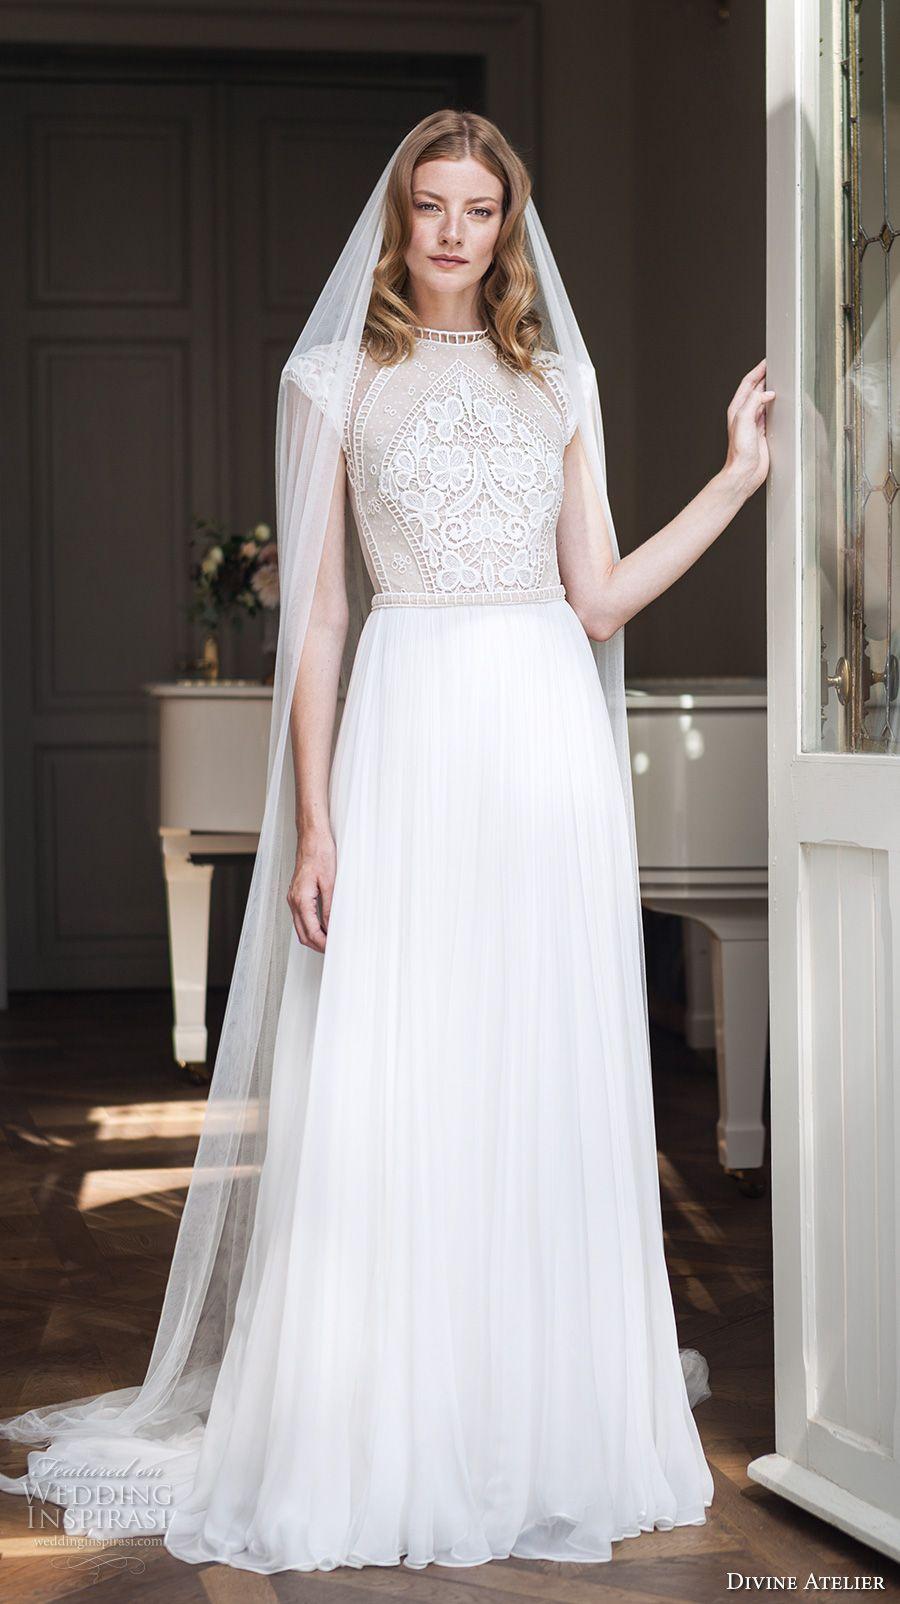 Divine atelier bridal cap sleeves round jewel neck heavily